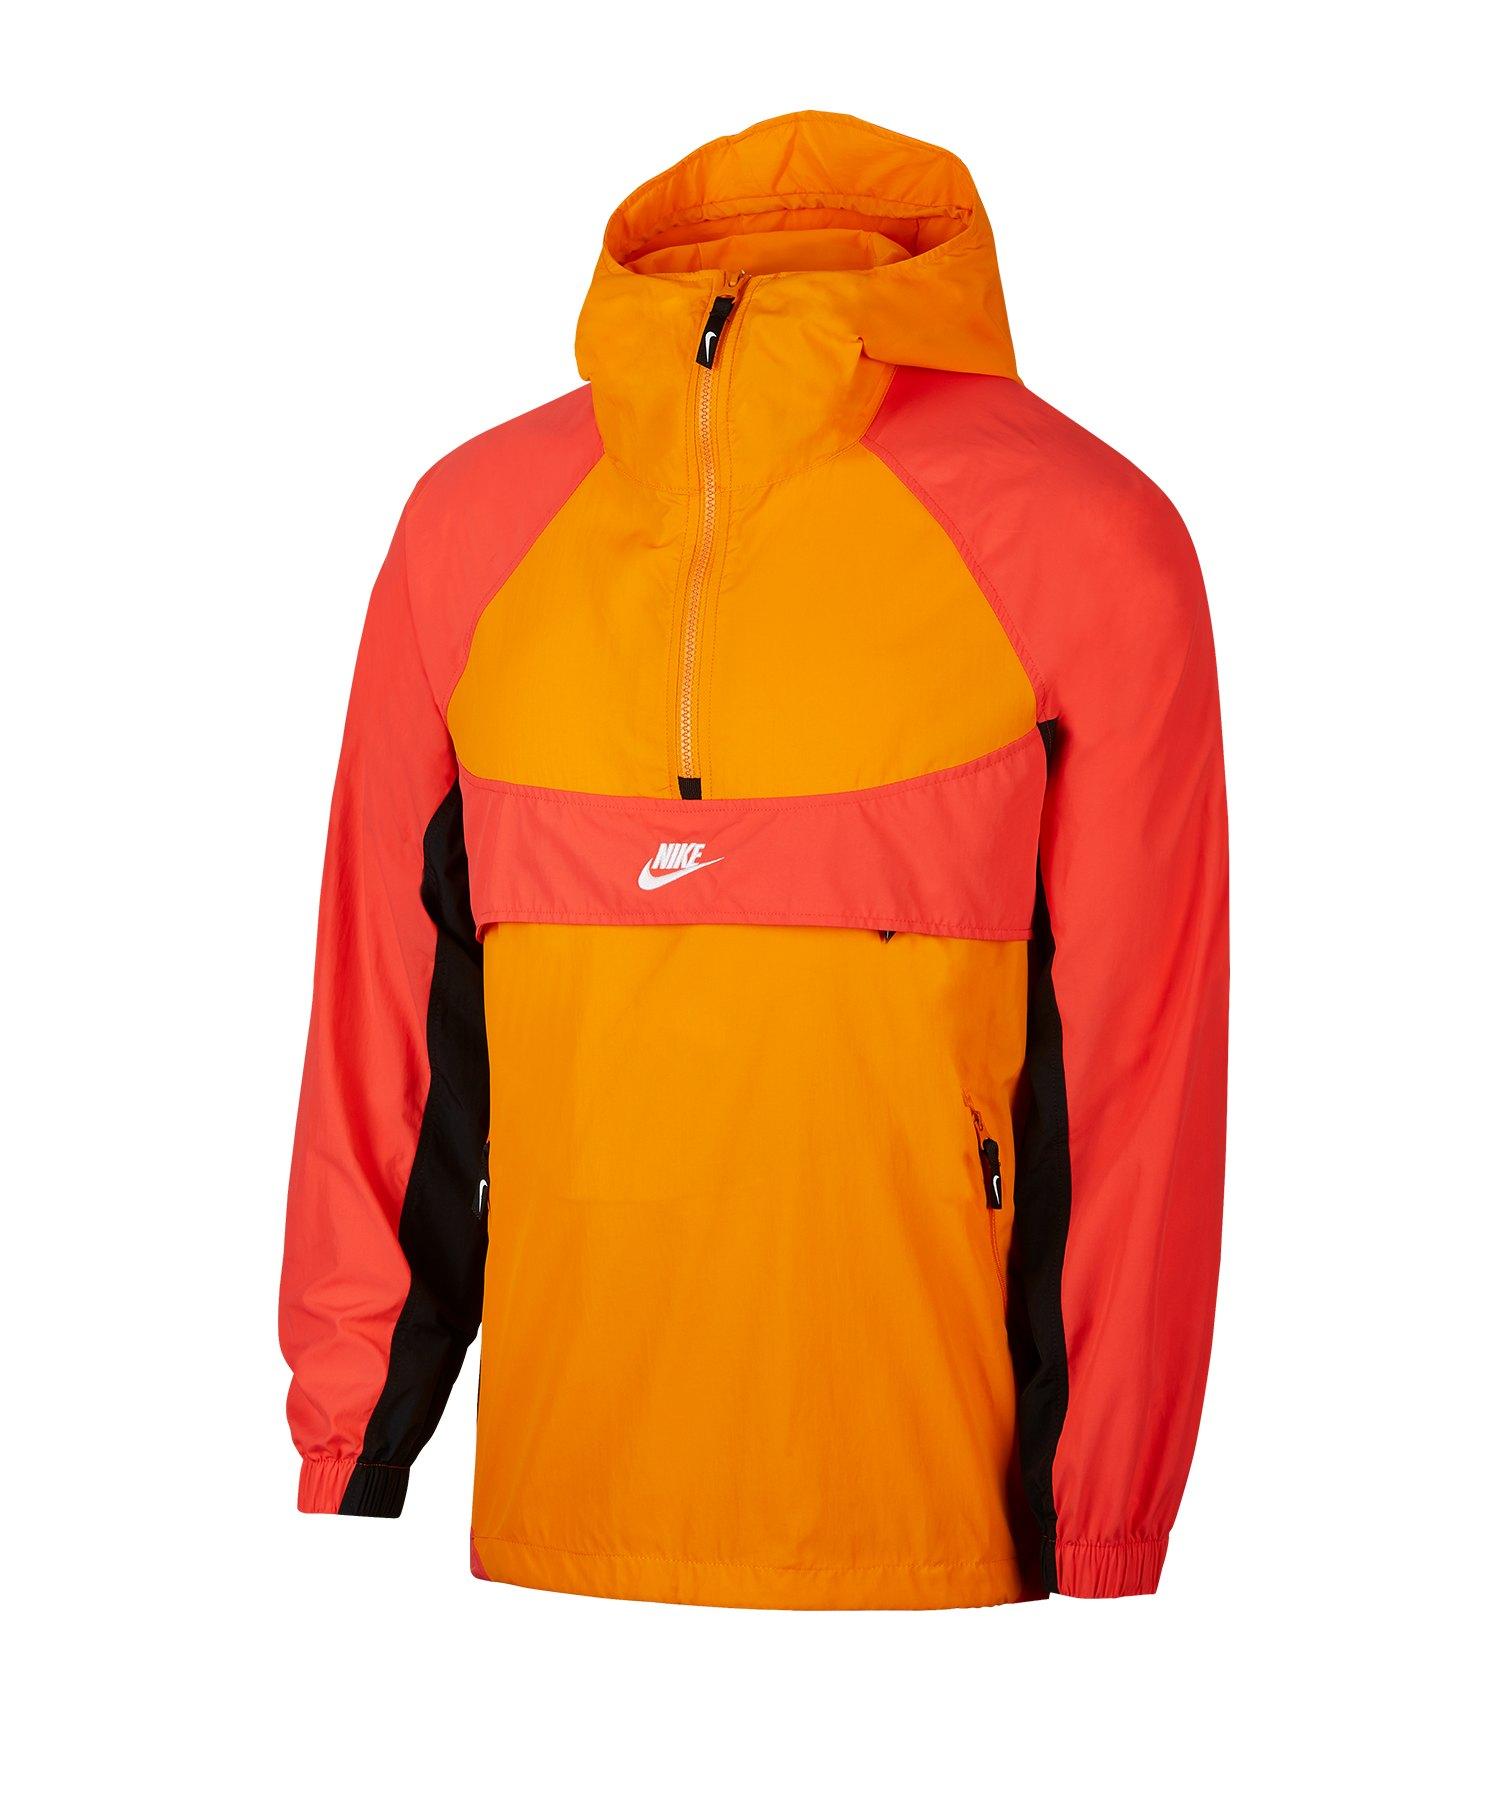 Nike Woven Re-Issue Trainingsjacke Rot F873 - rot